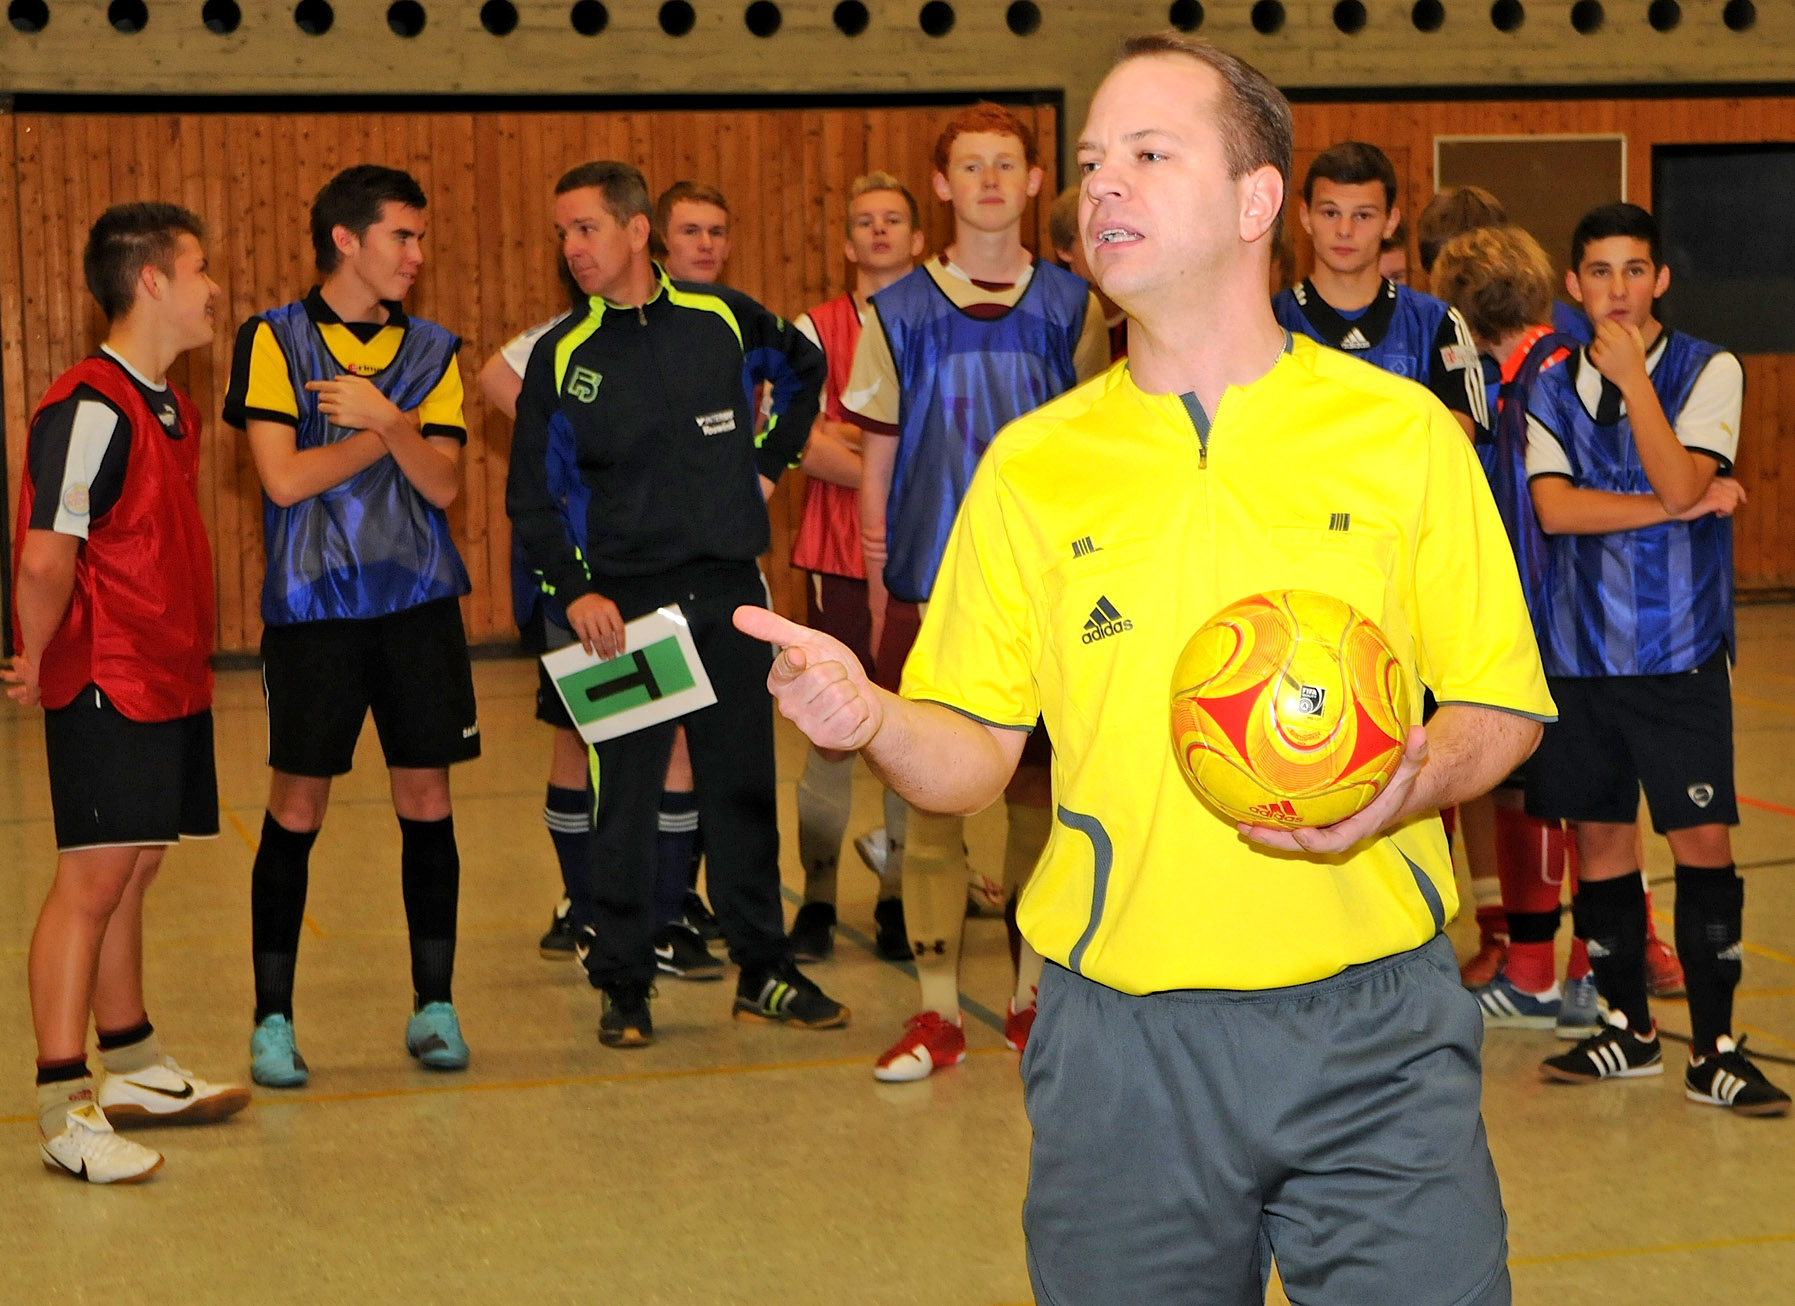 Hildesheimer leitet Endspiel des DFB-Futsal-Cups